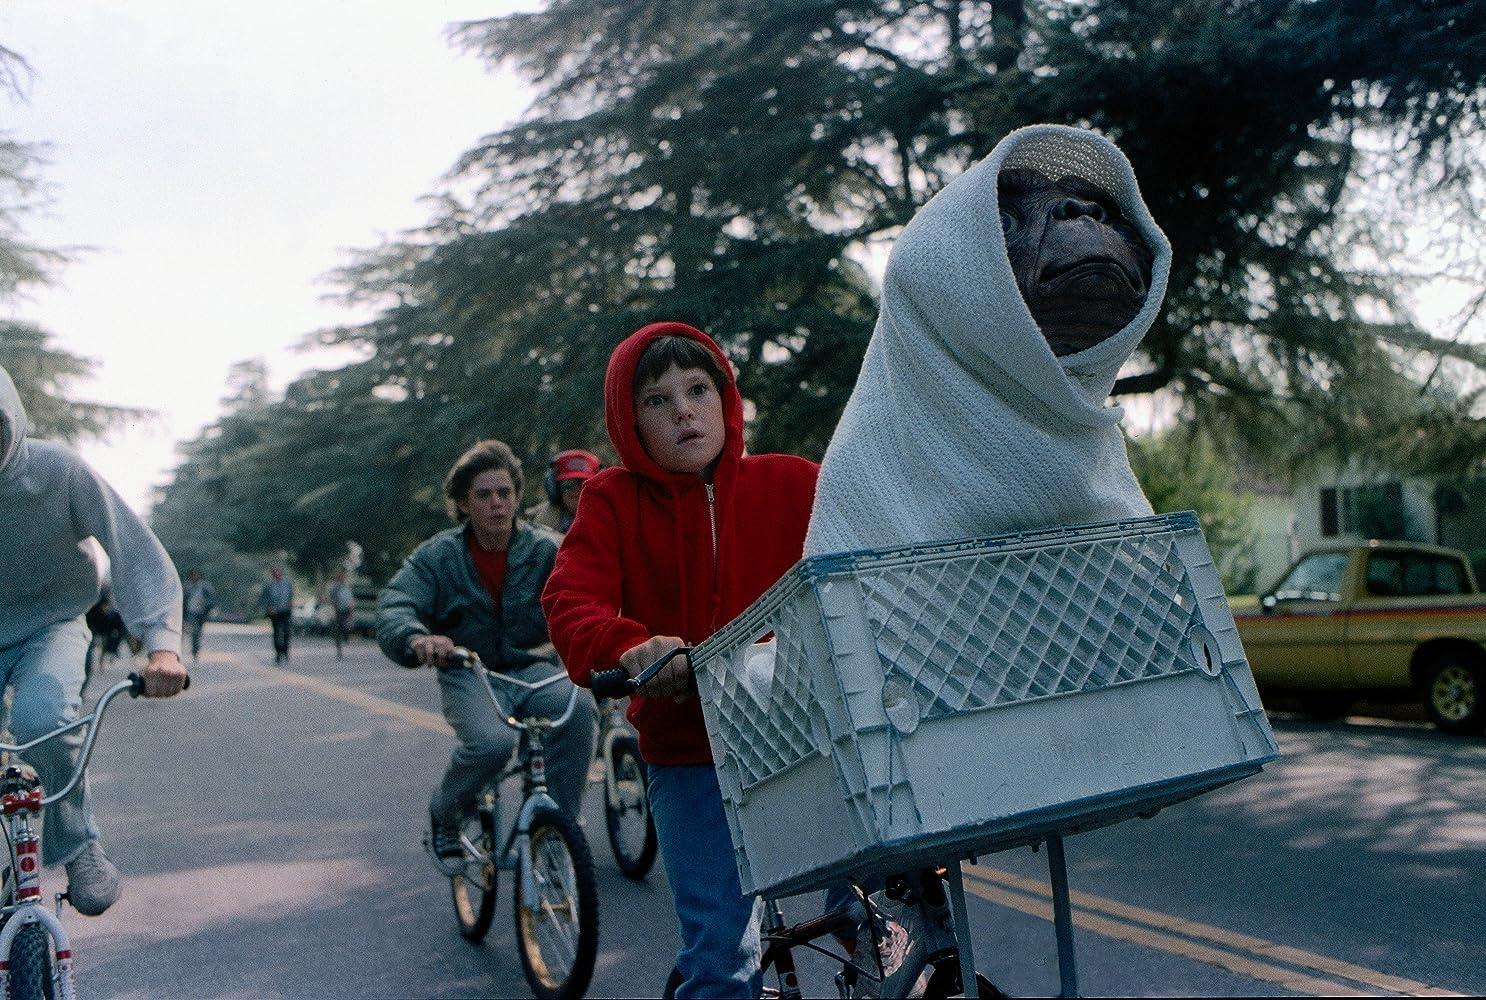 C. Thomas Howell, Henry Thomas, Robert MacNaughton, K.C. Martel, and Pat Welsh in E.T. the Extra-Terrestrial (1982)